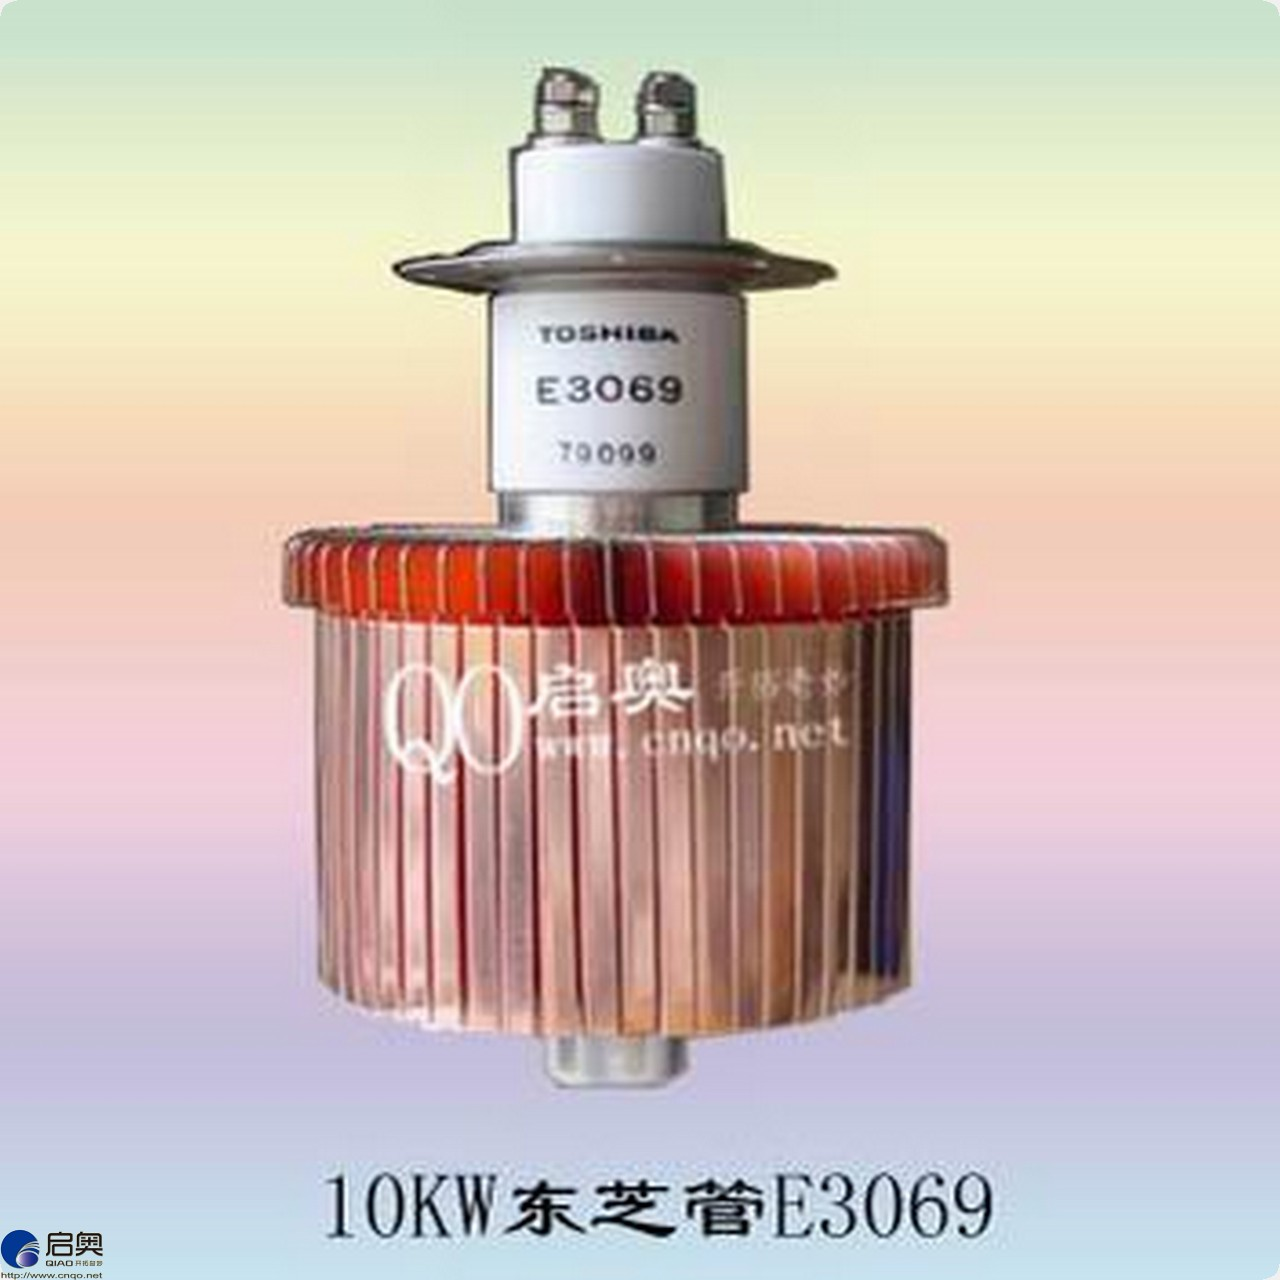 10KW Toshiba oscillation tube